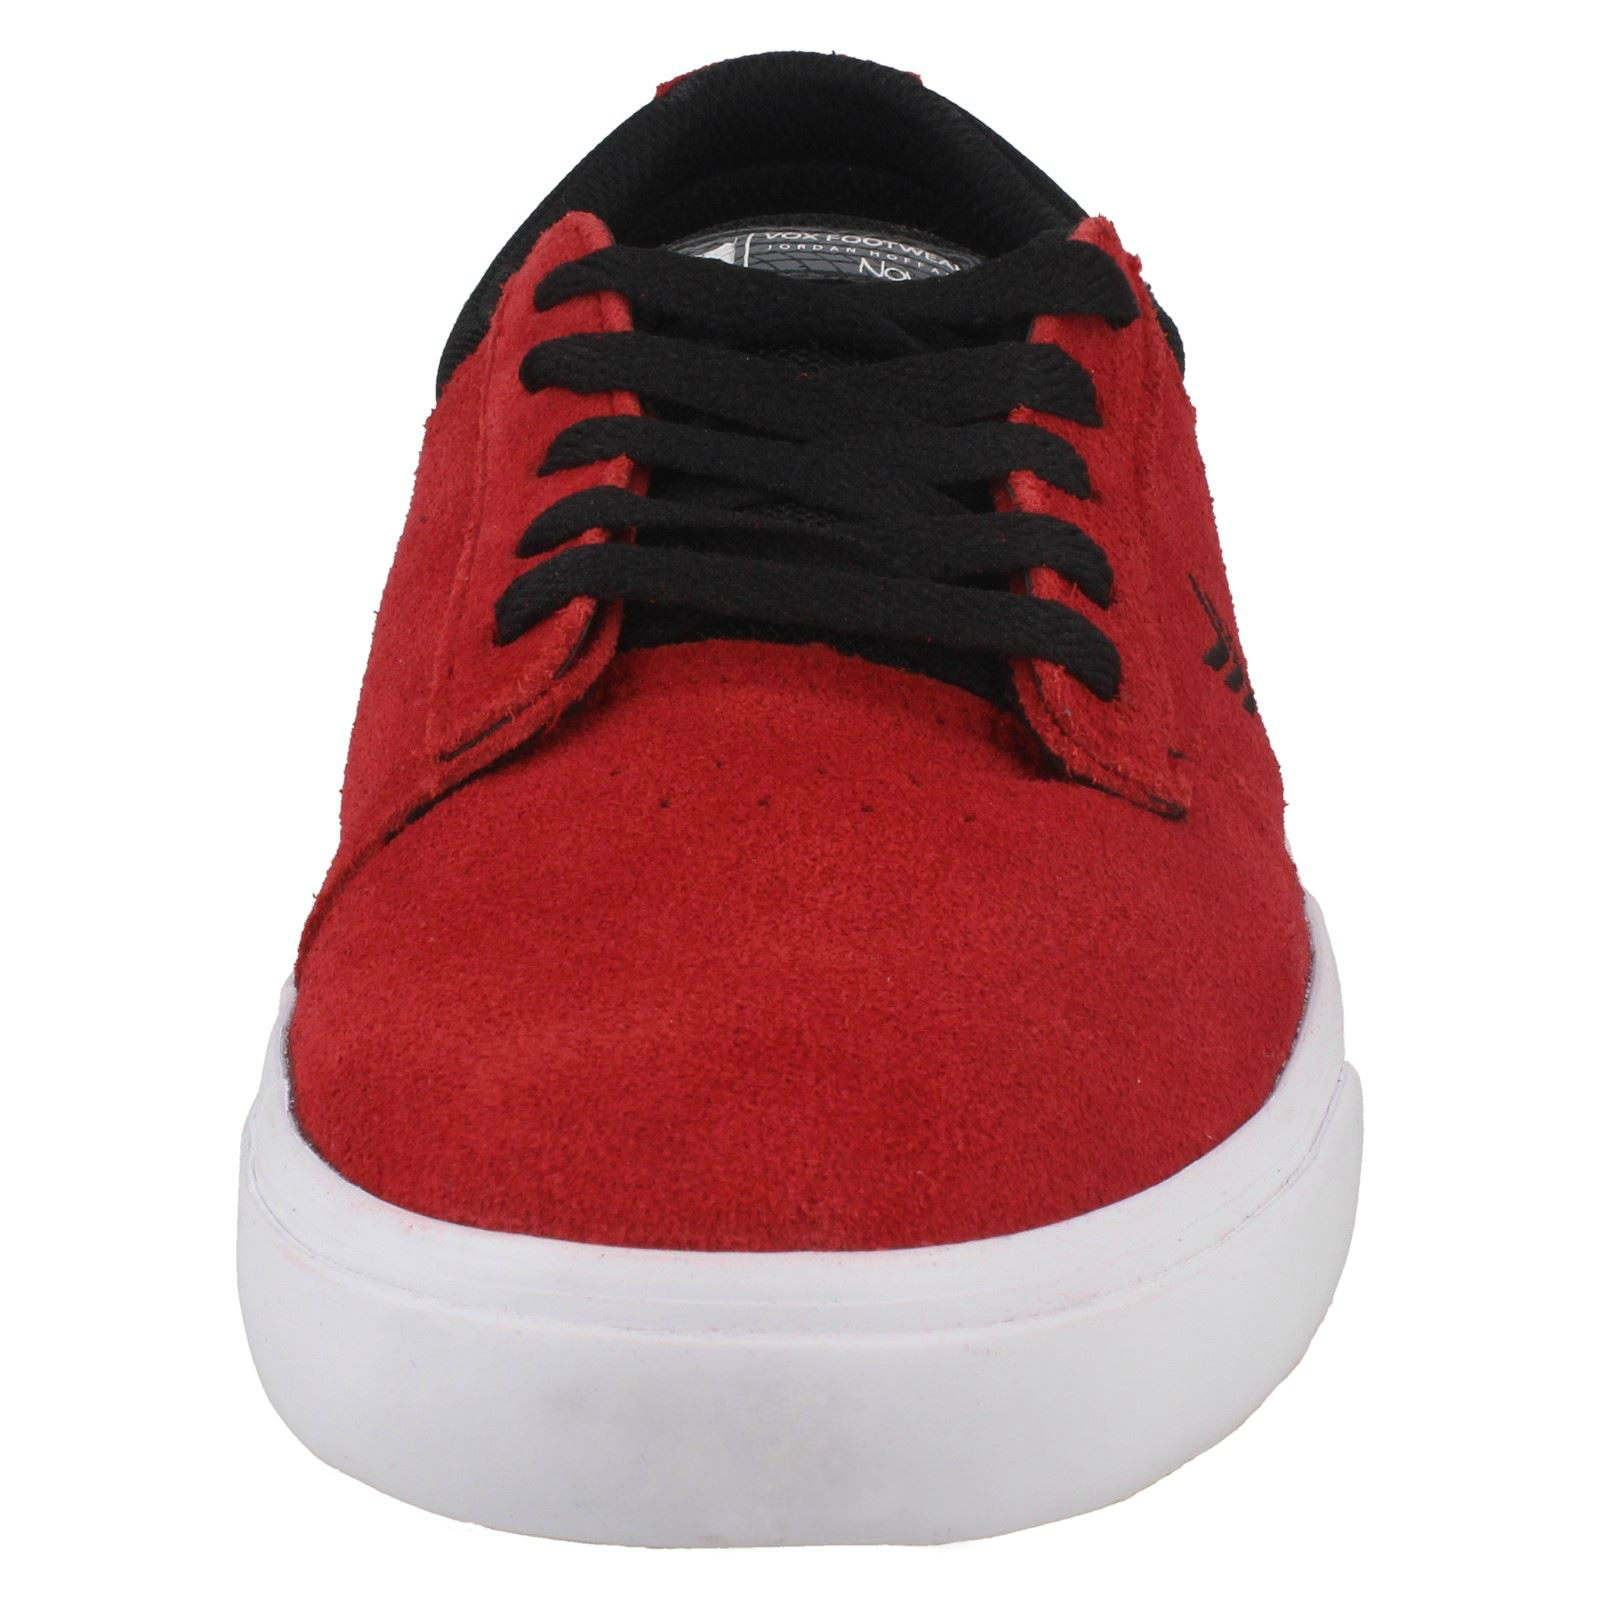 Vox Casual Footwear Inc  Uomo Casual Vox Trainers - Nova a0ad93